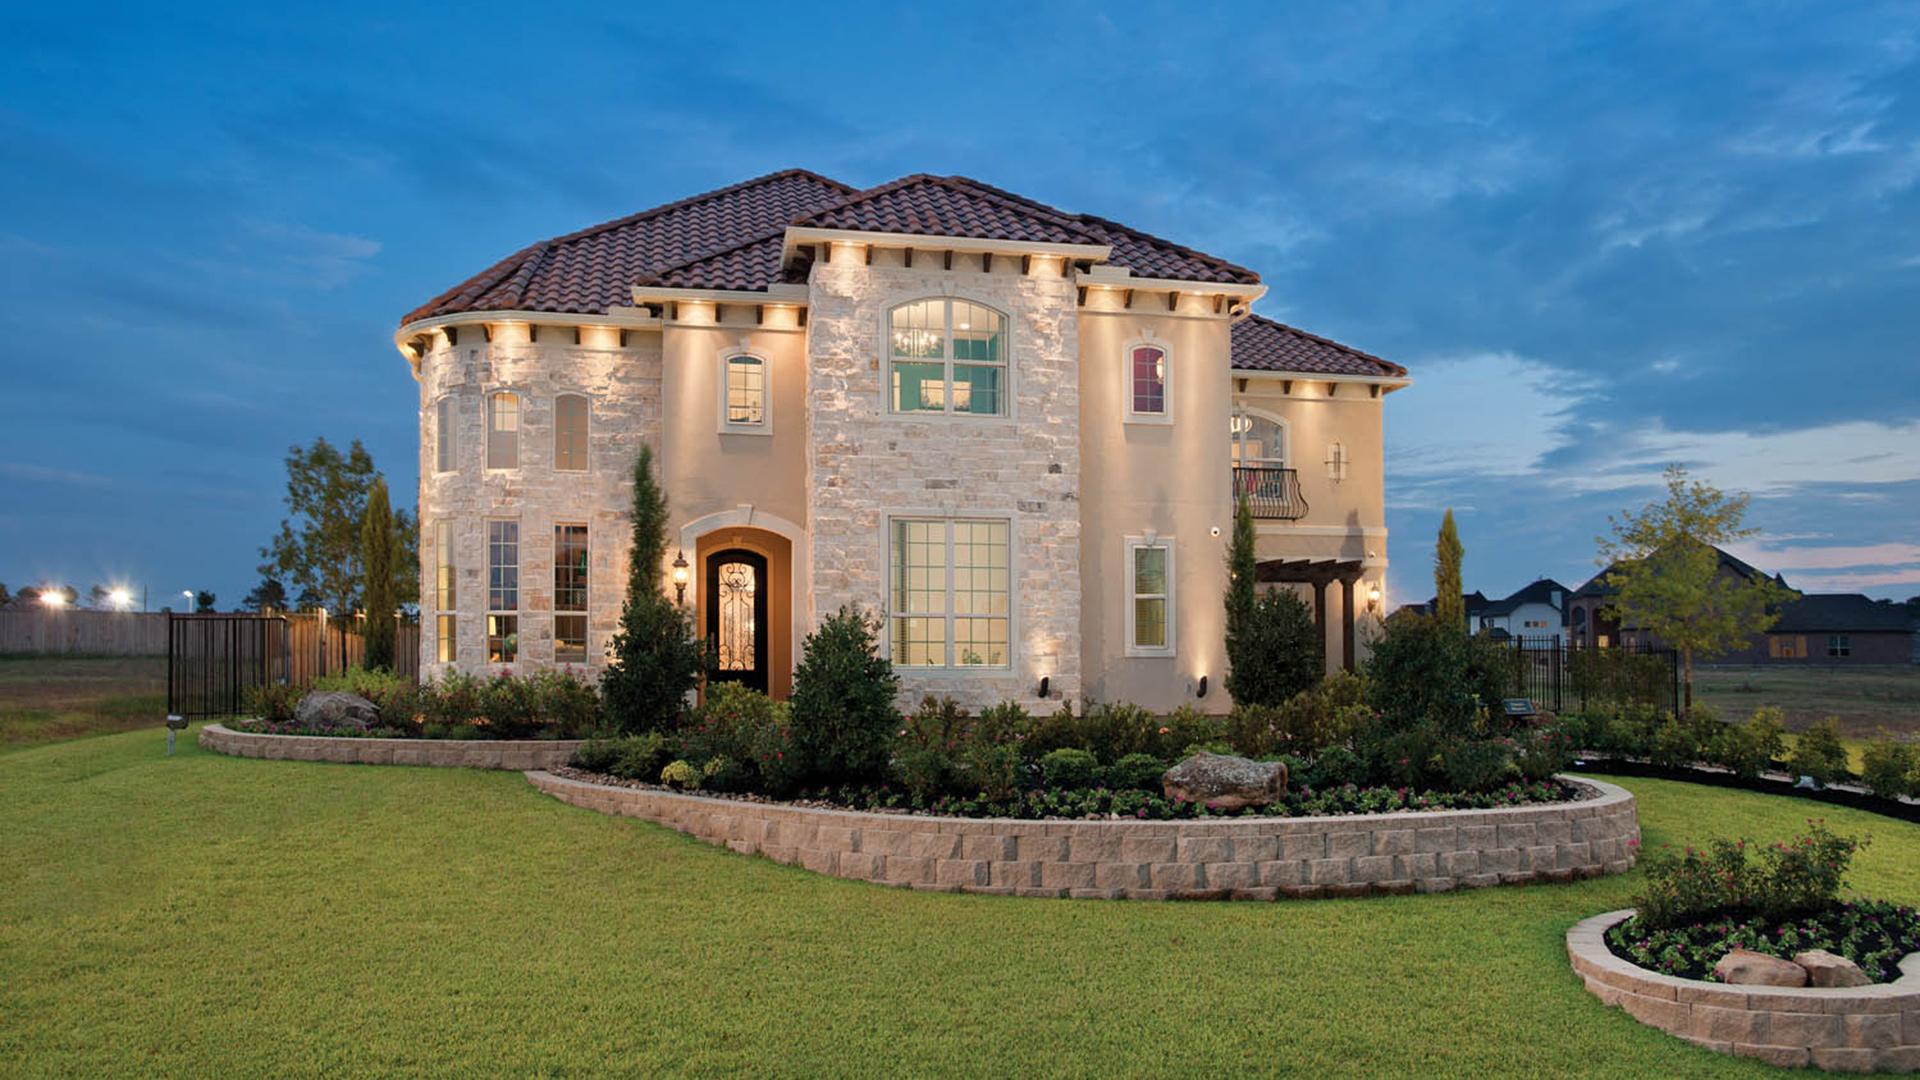 star trail | the vitoria home design